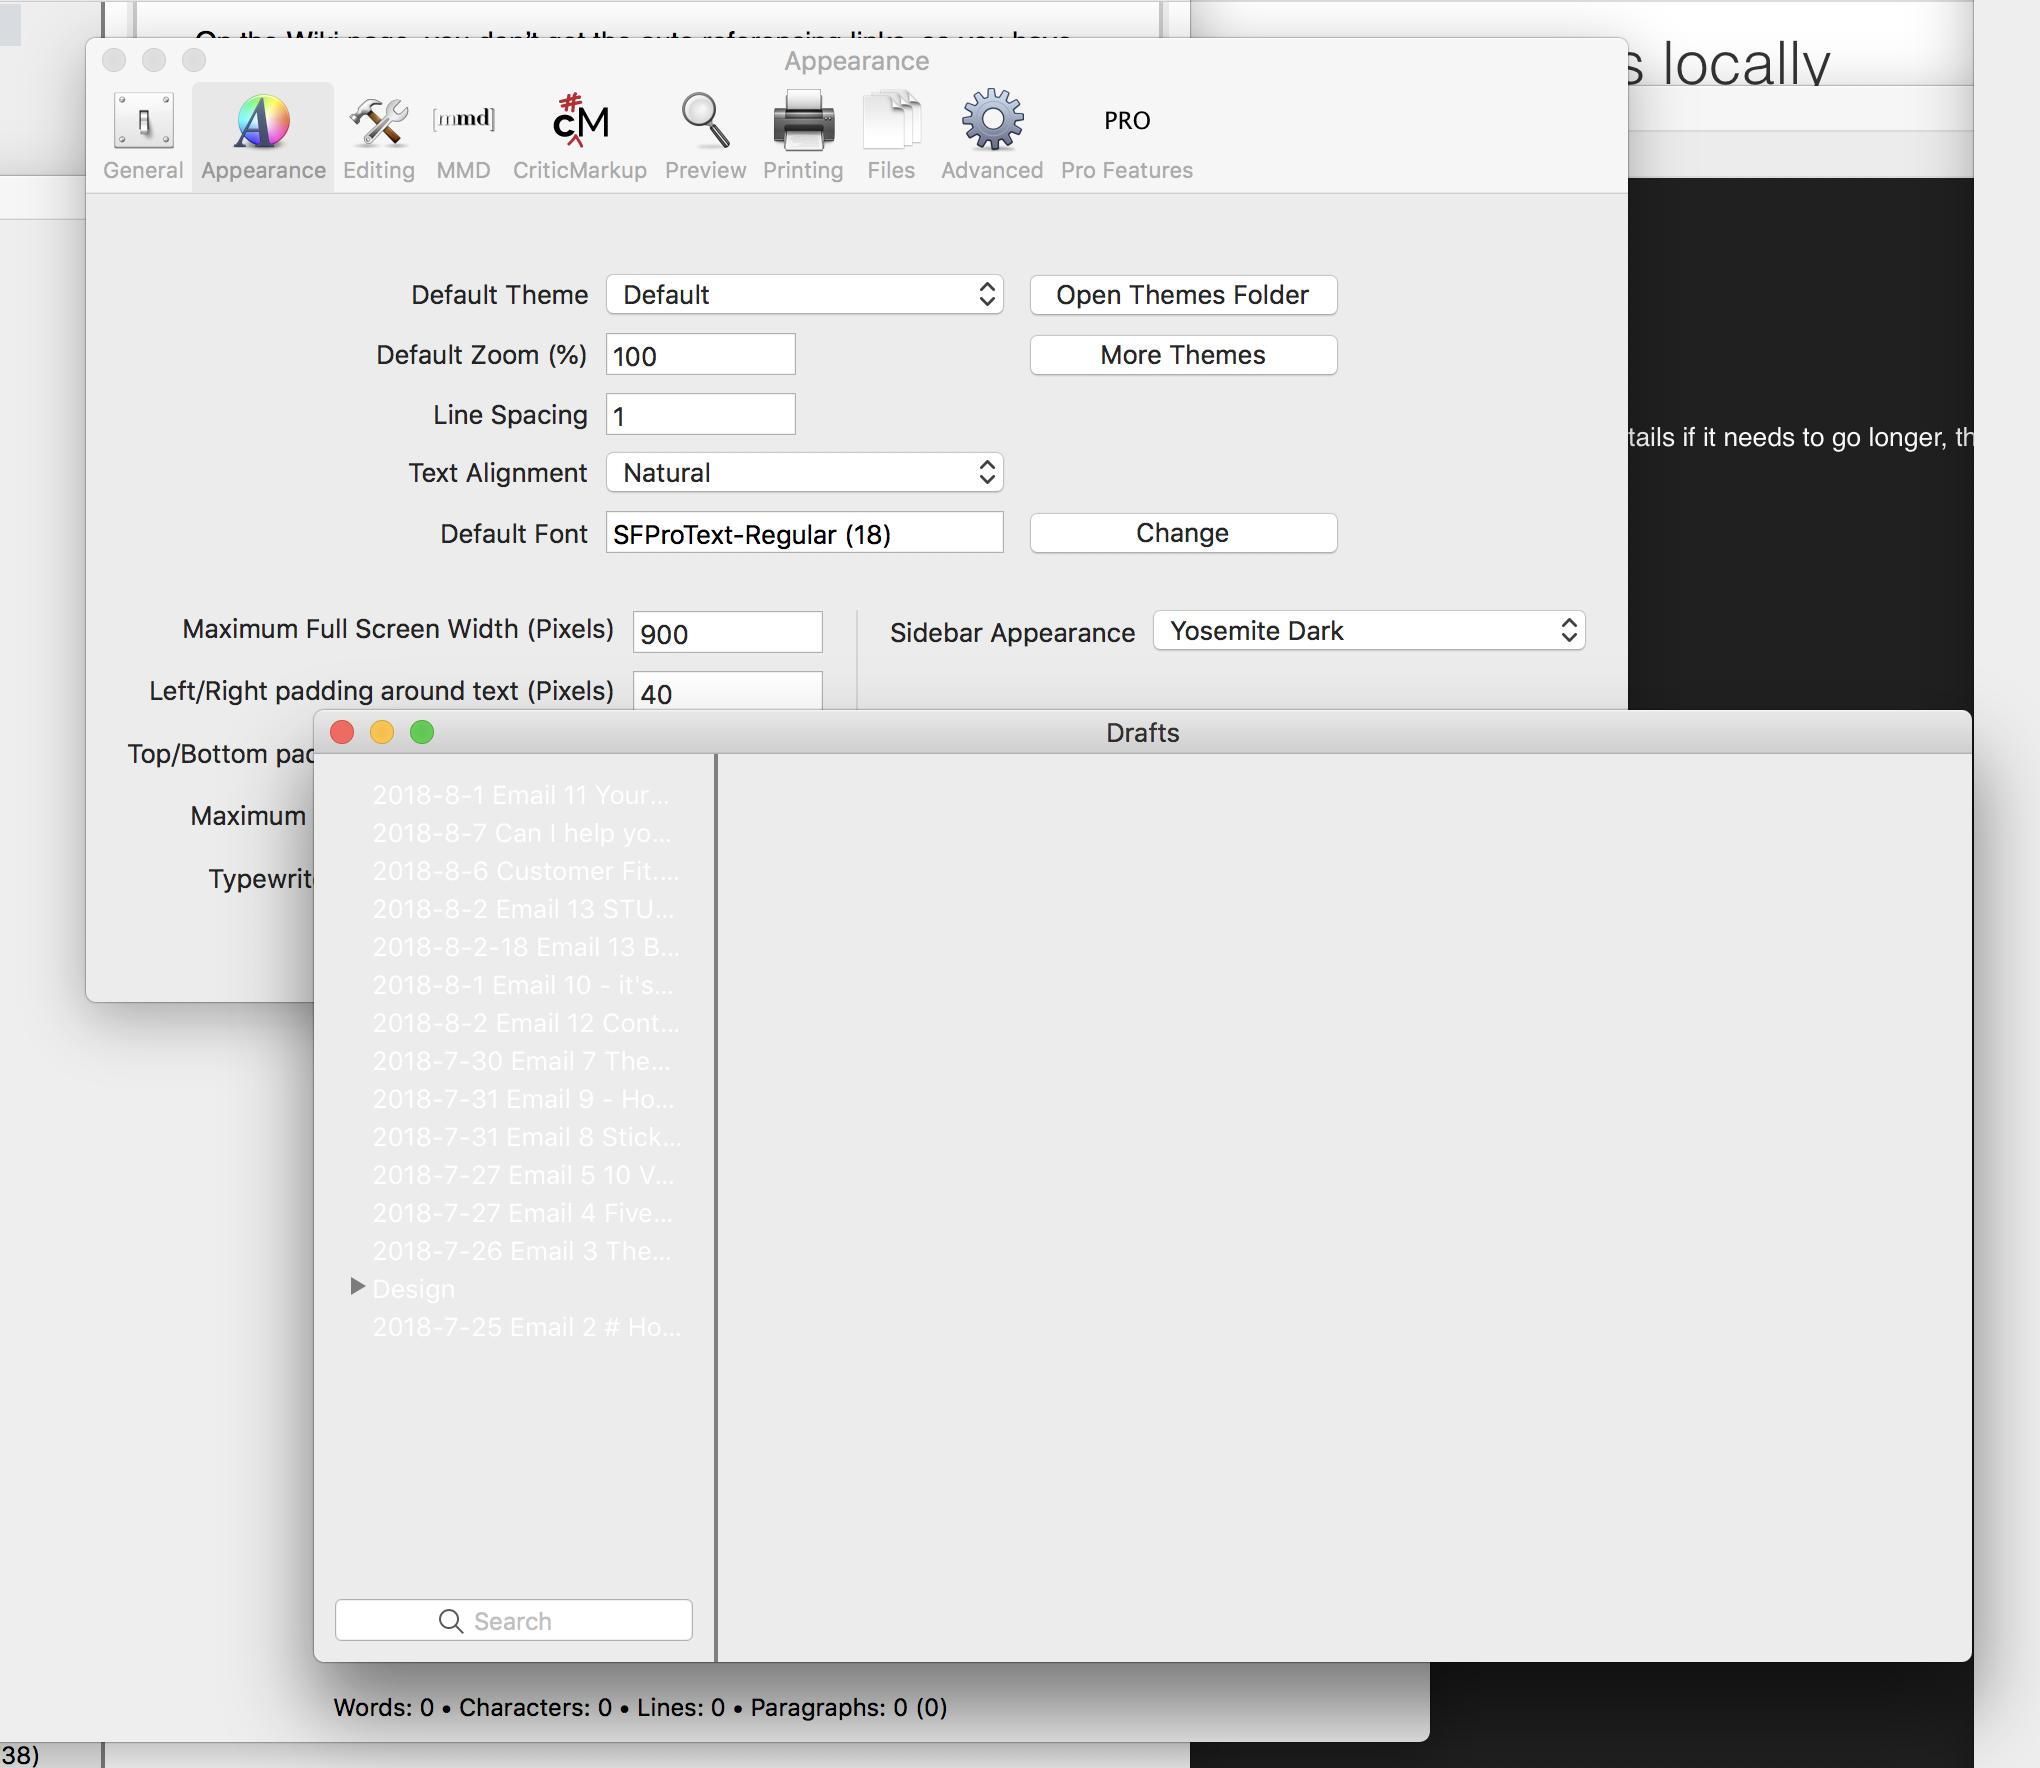 Yosemite_dark_issue_-_open_folder